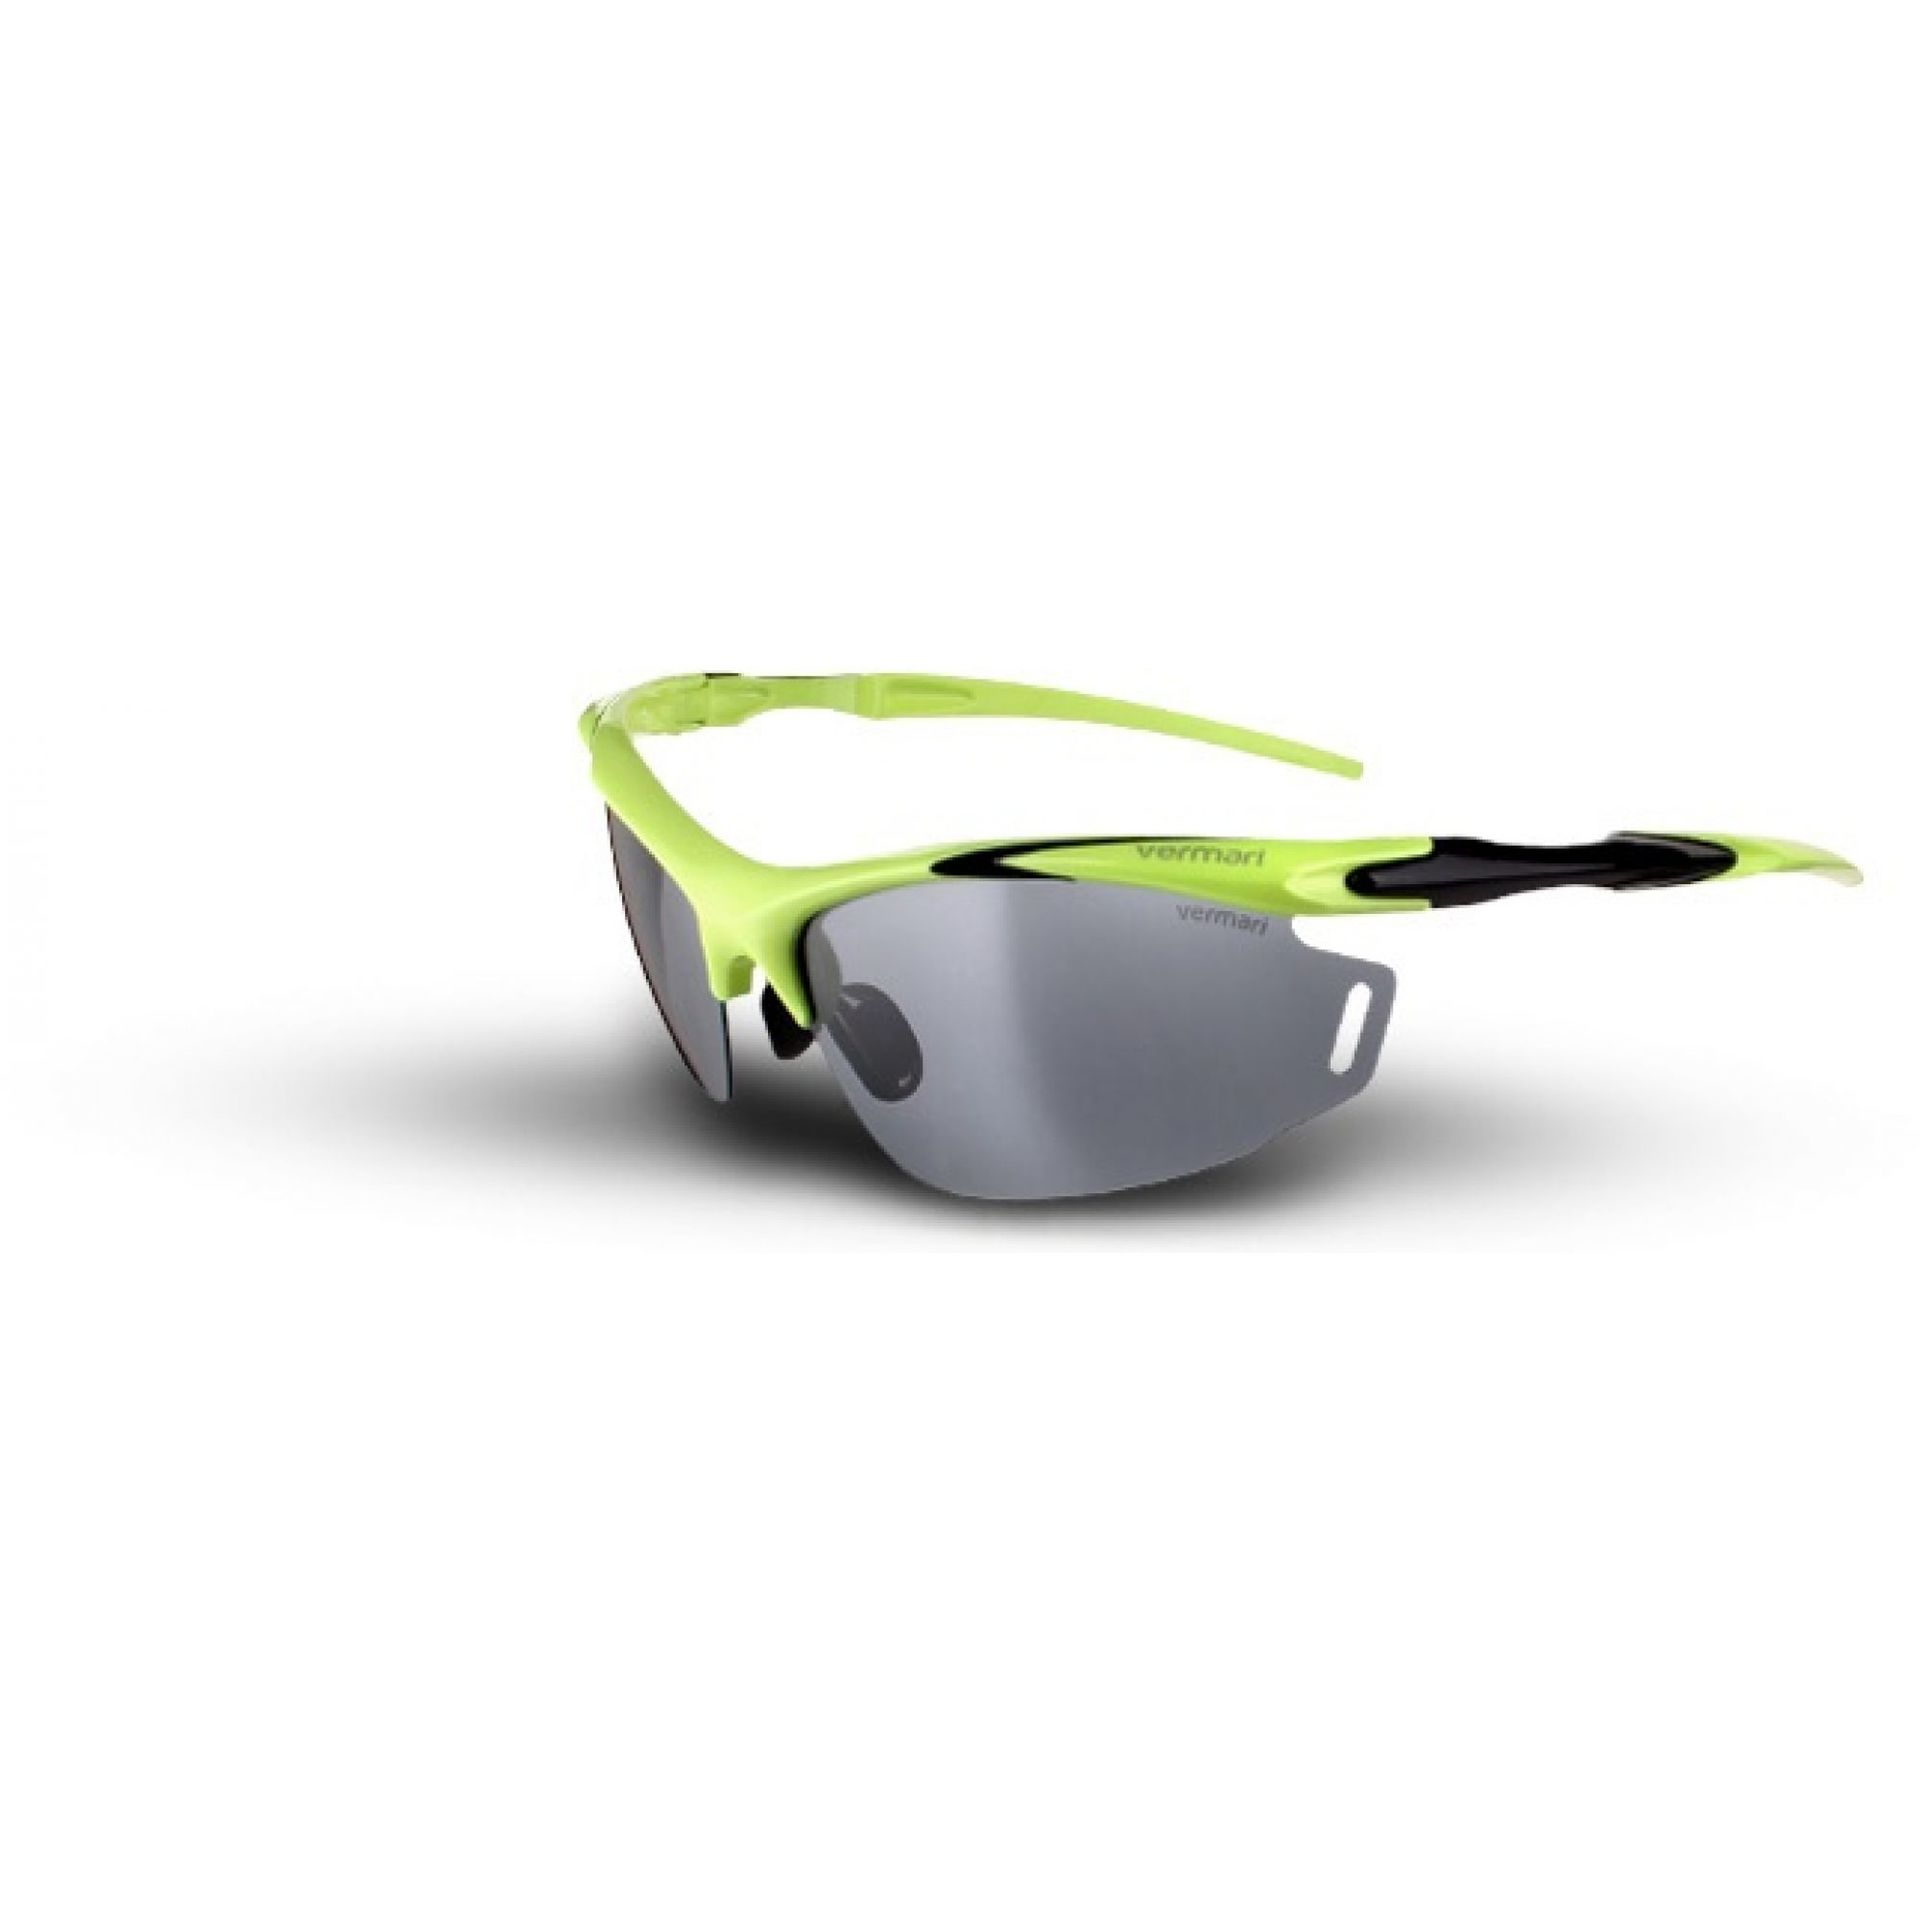 Okulary Vermari VR306C Extreme